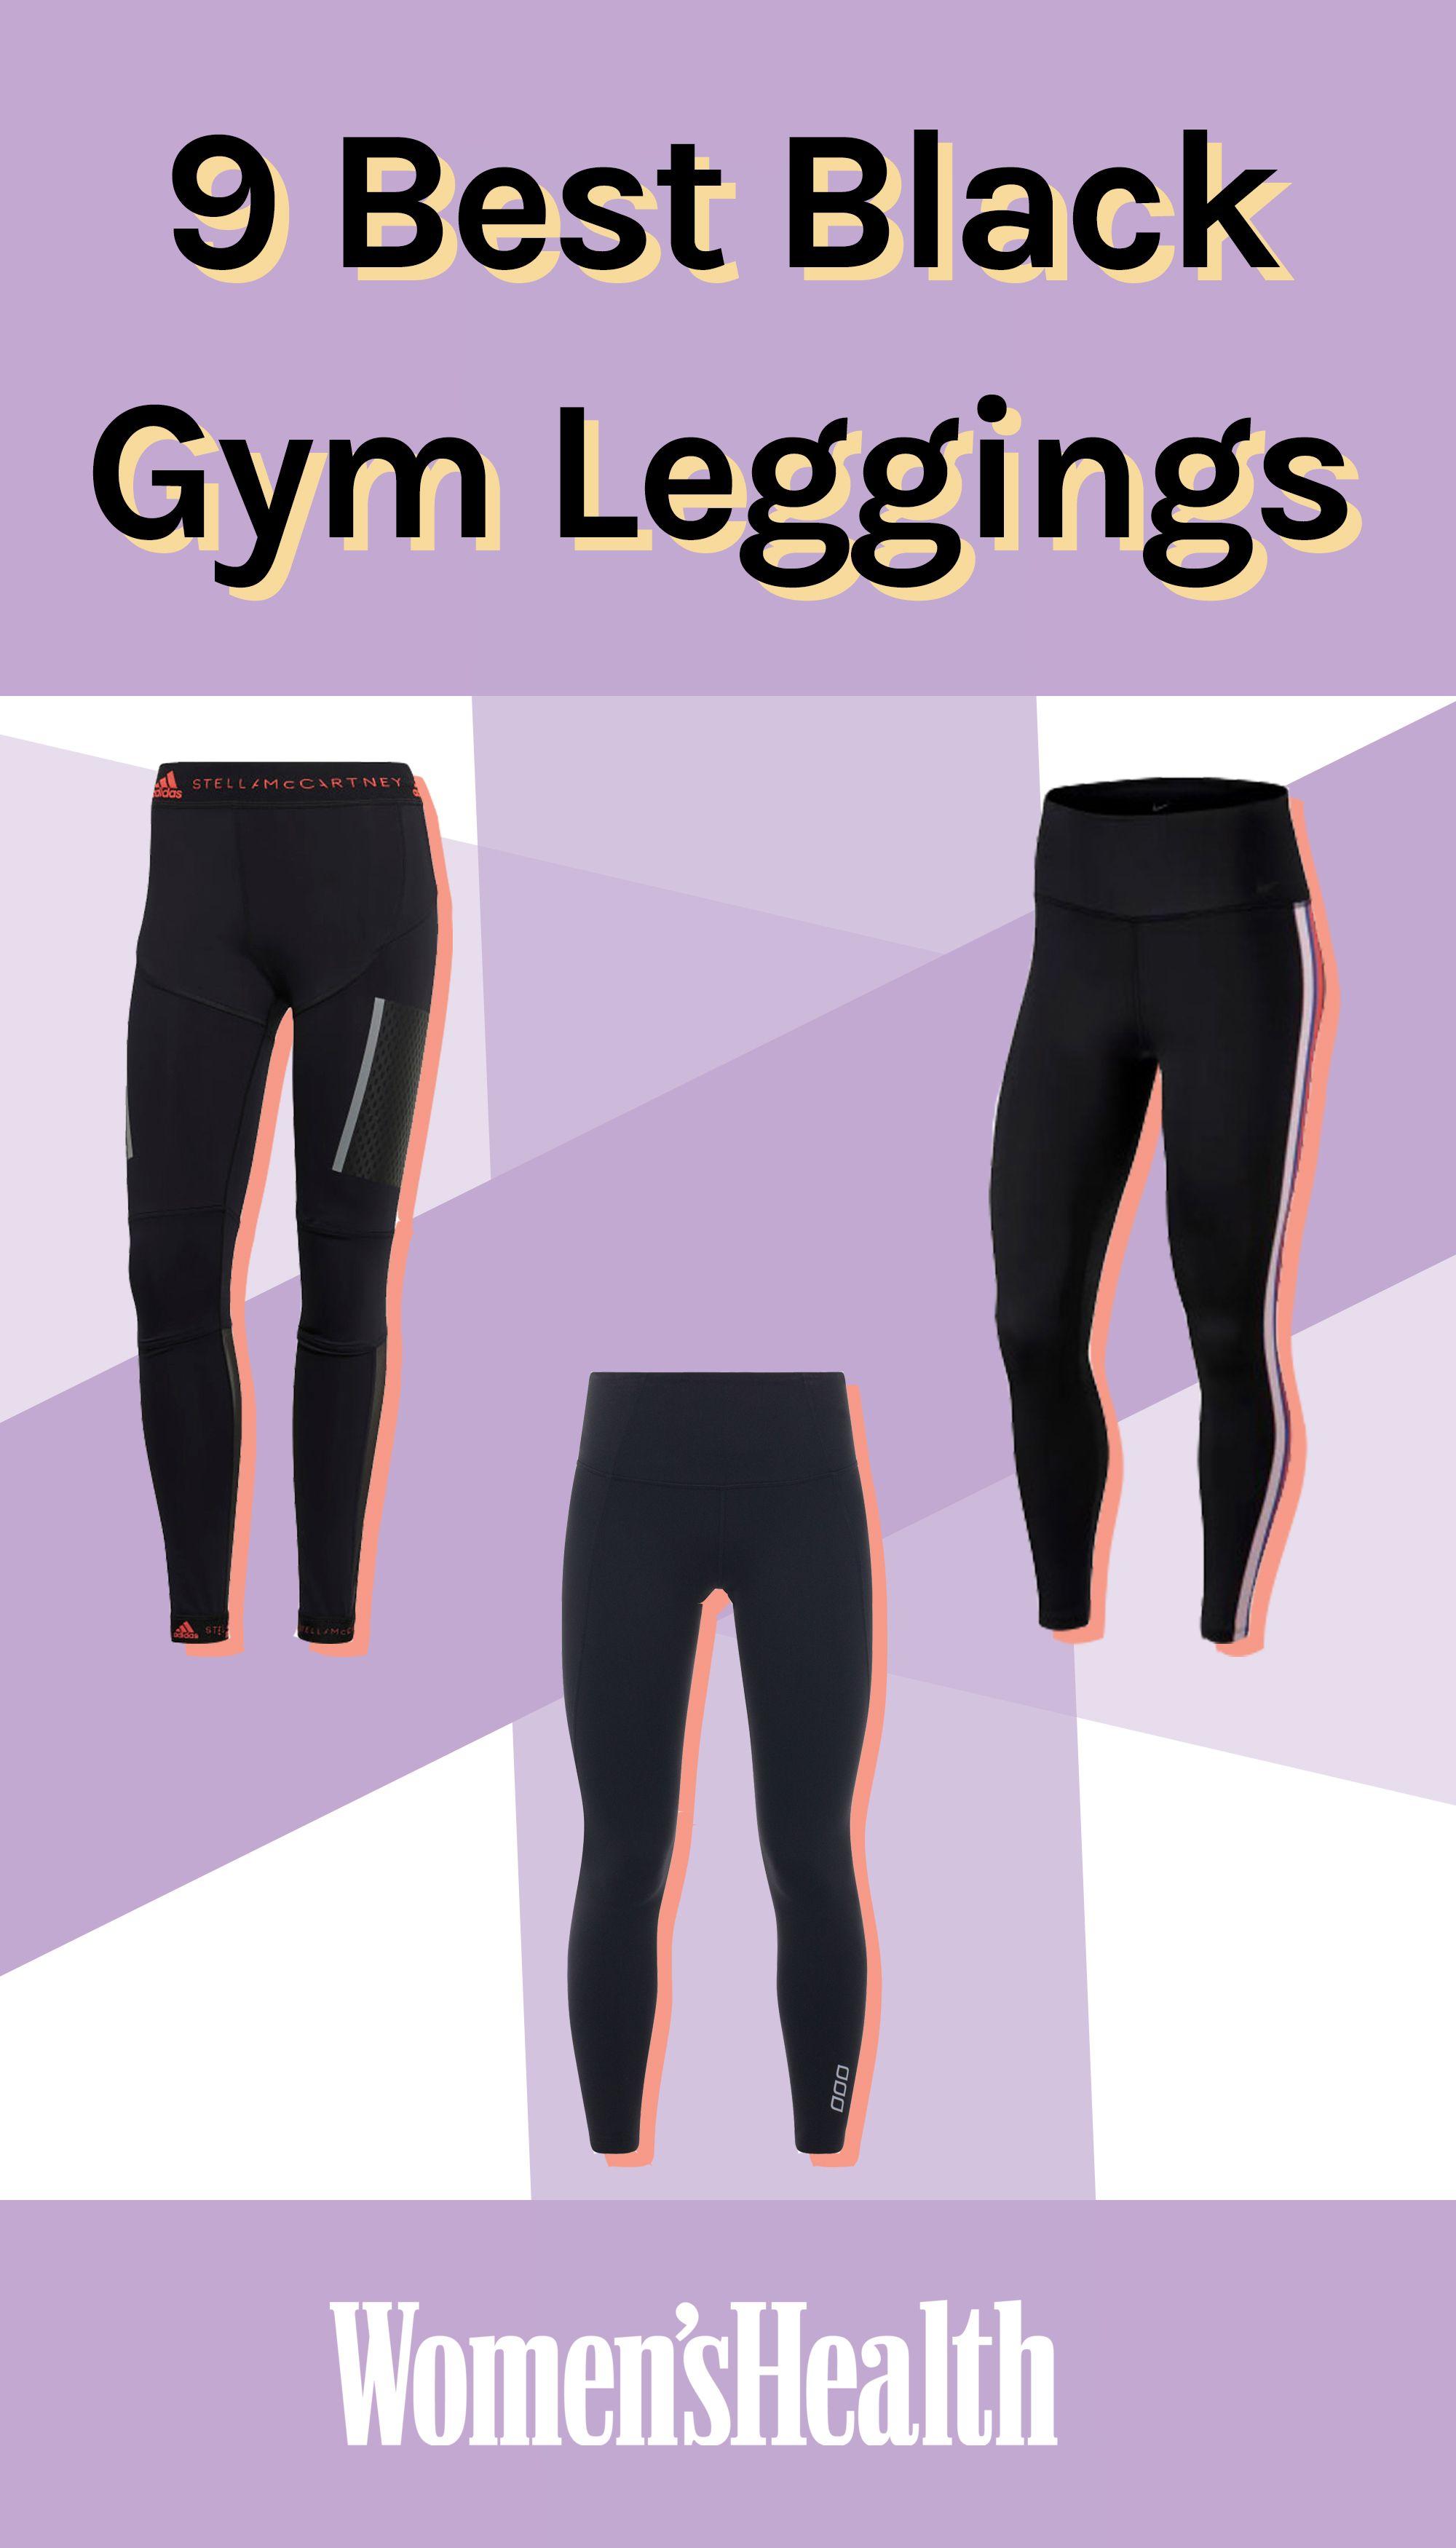 Best Black Gym Leggings